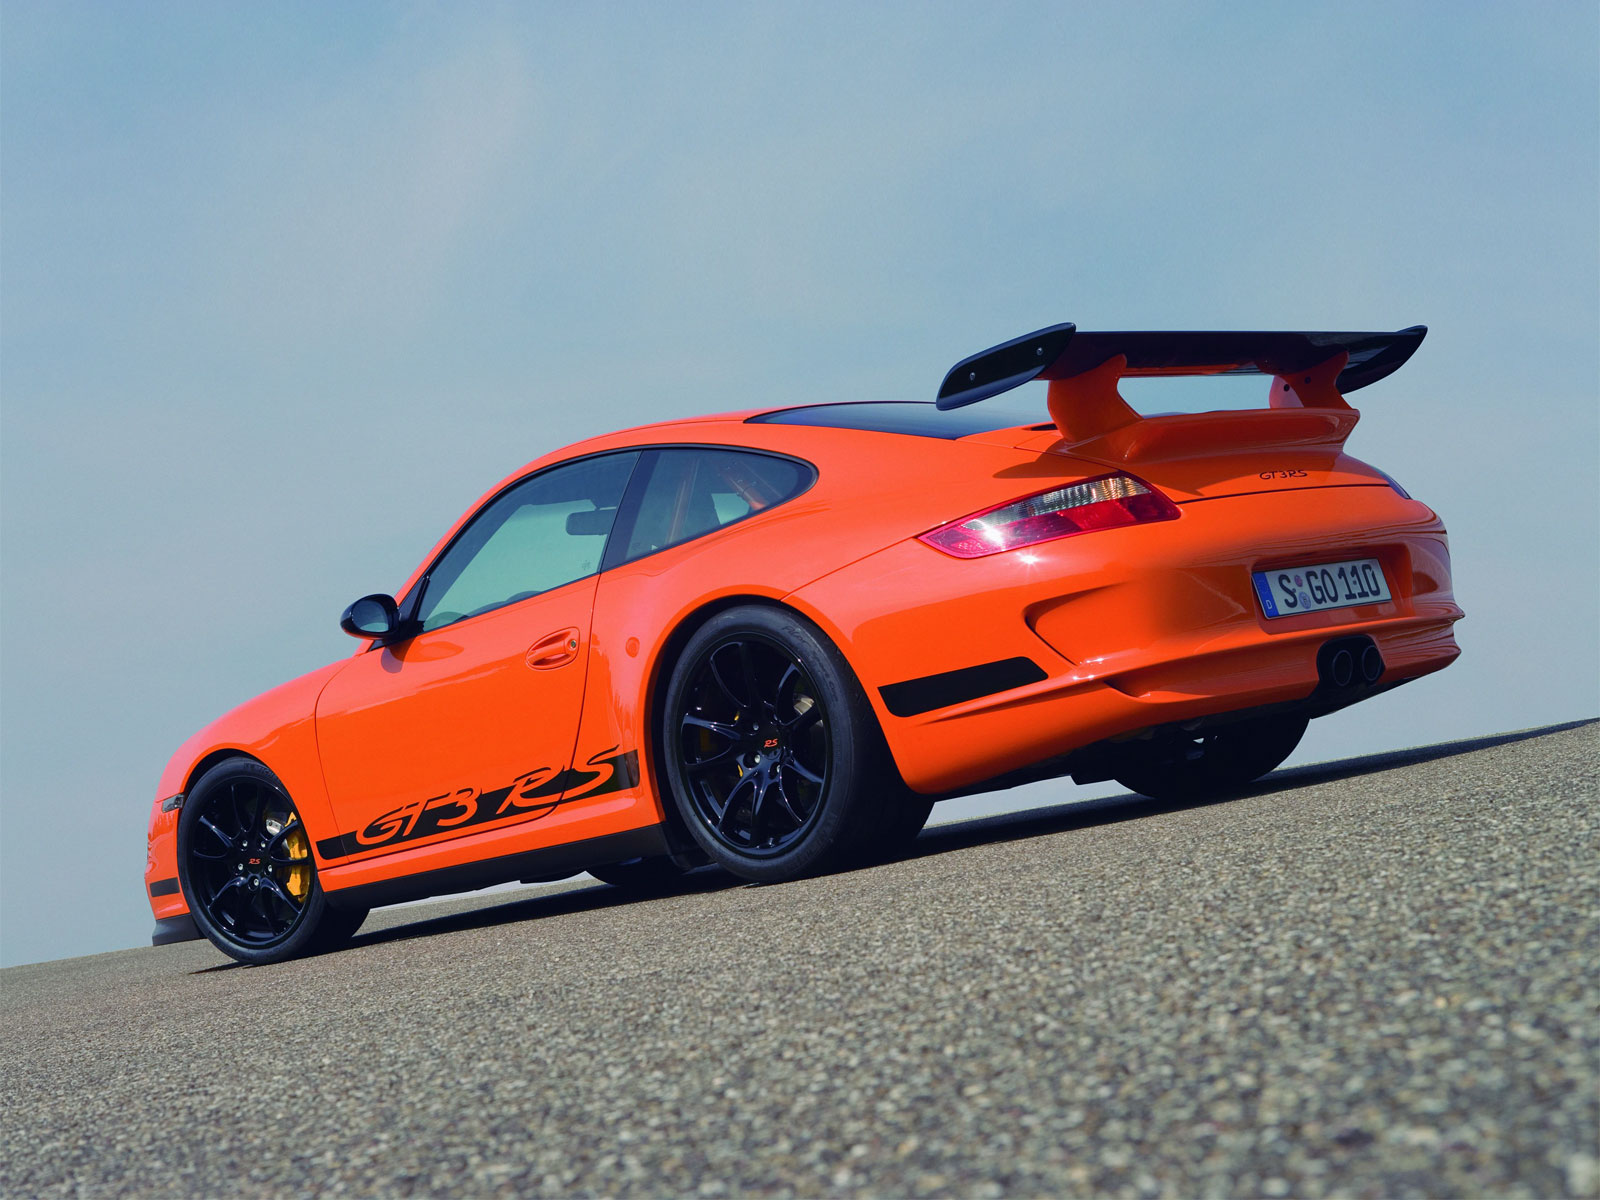 Porsche 911 Gt3 Rs Is 2010 Best Driver S Car Forcegt Com